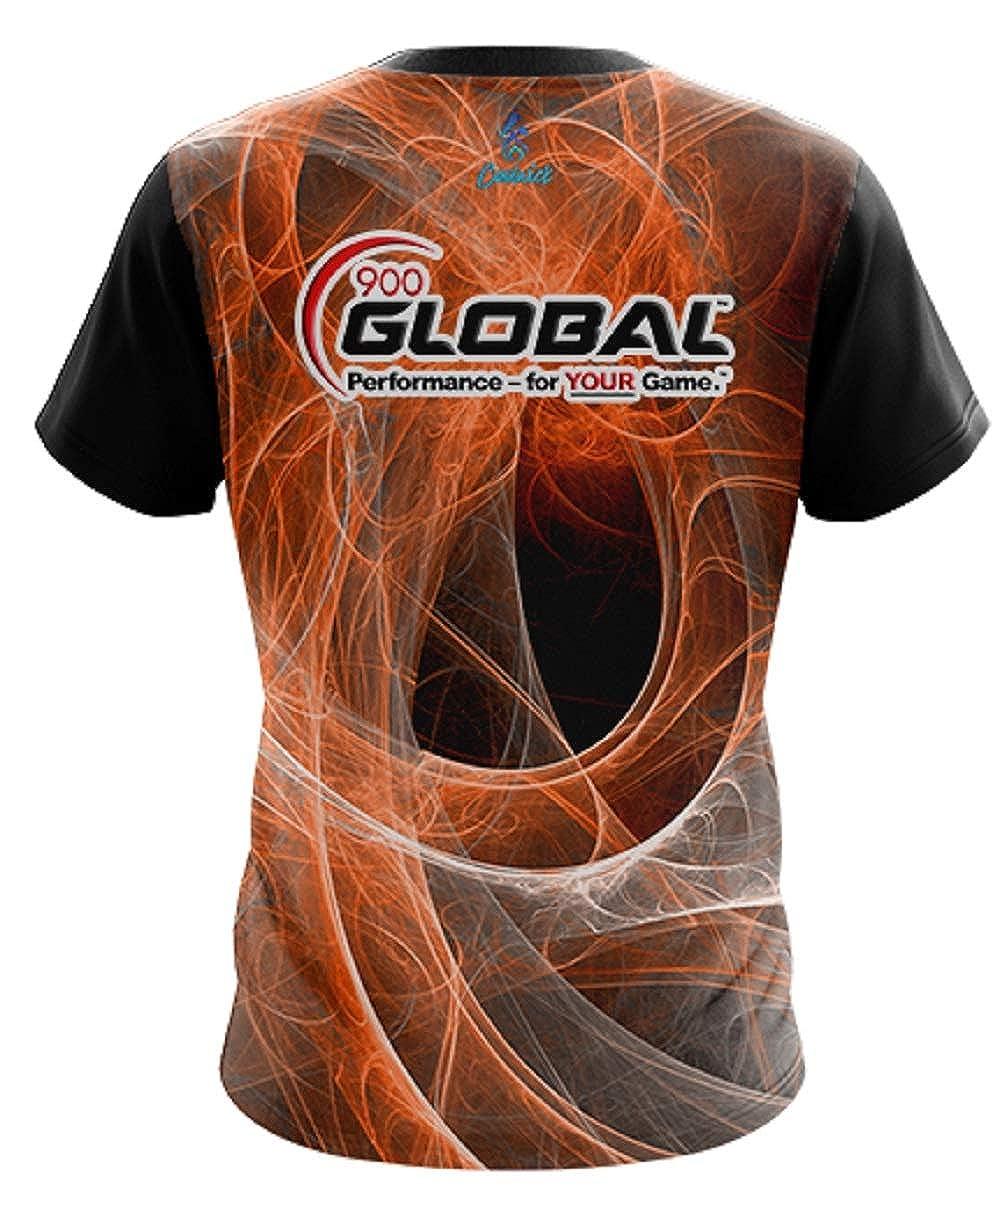 CoolWick 900 Global Men Energy Swirls Orange Bowling Jersey